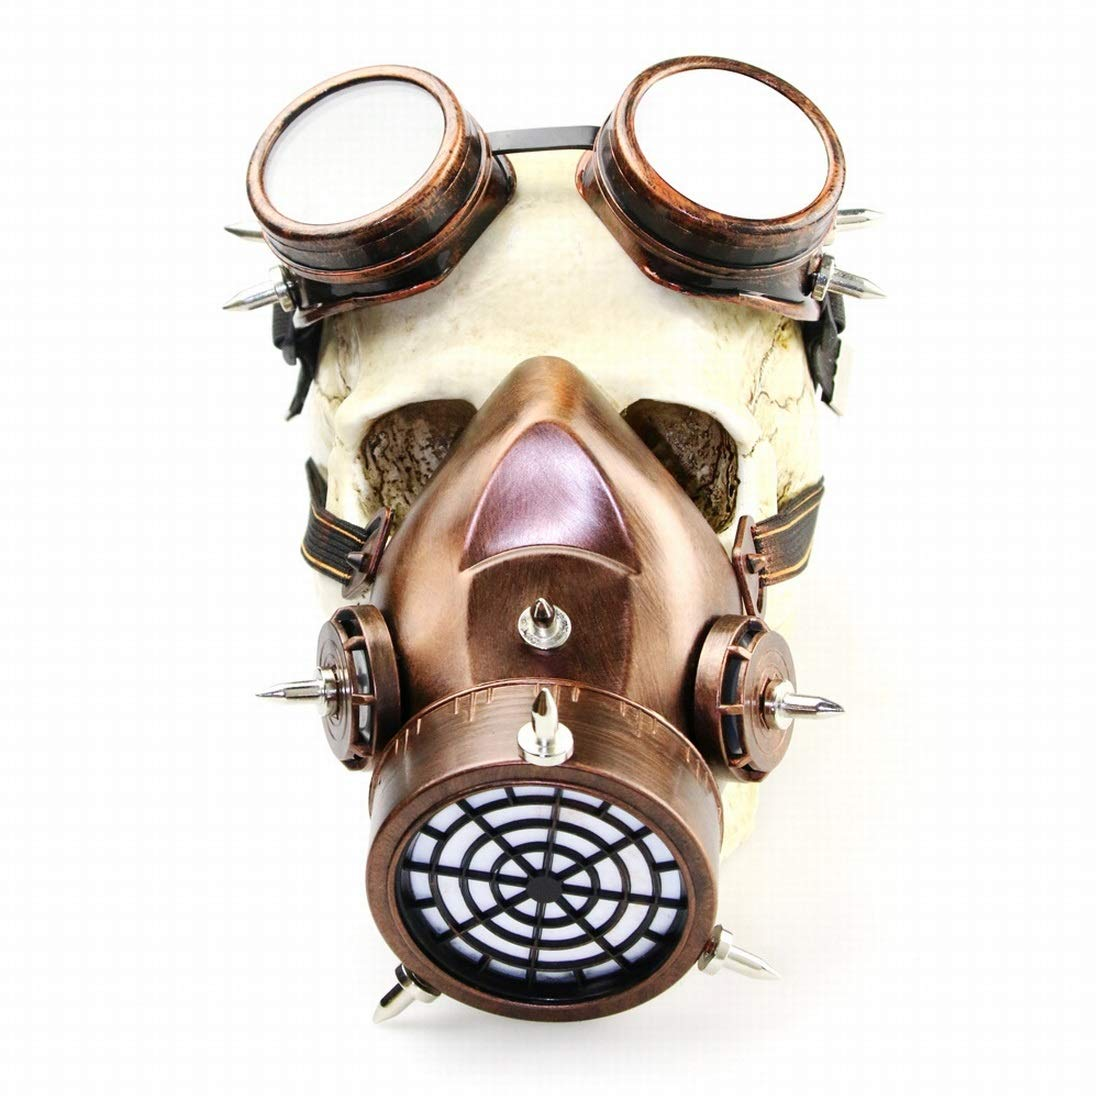 AREDOVL Maschera Antigas Steampunk Maschera Gotica per Cosplay Party